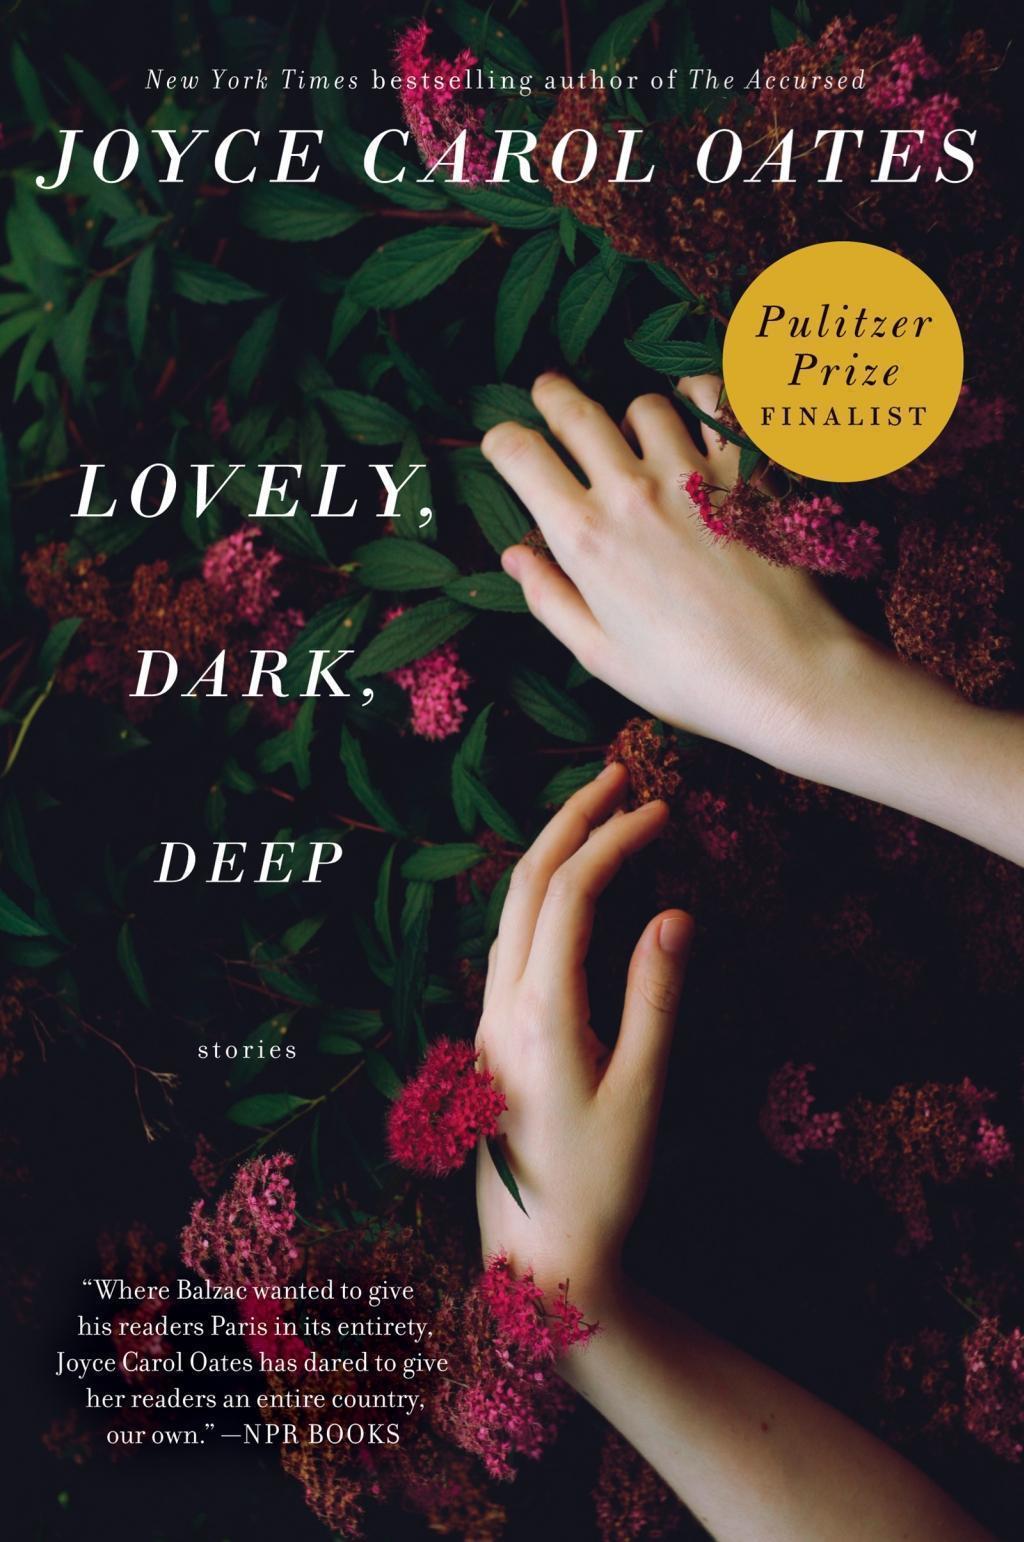 Lovely, Dark, Deep